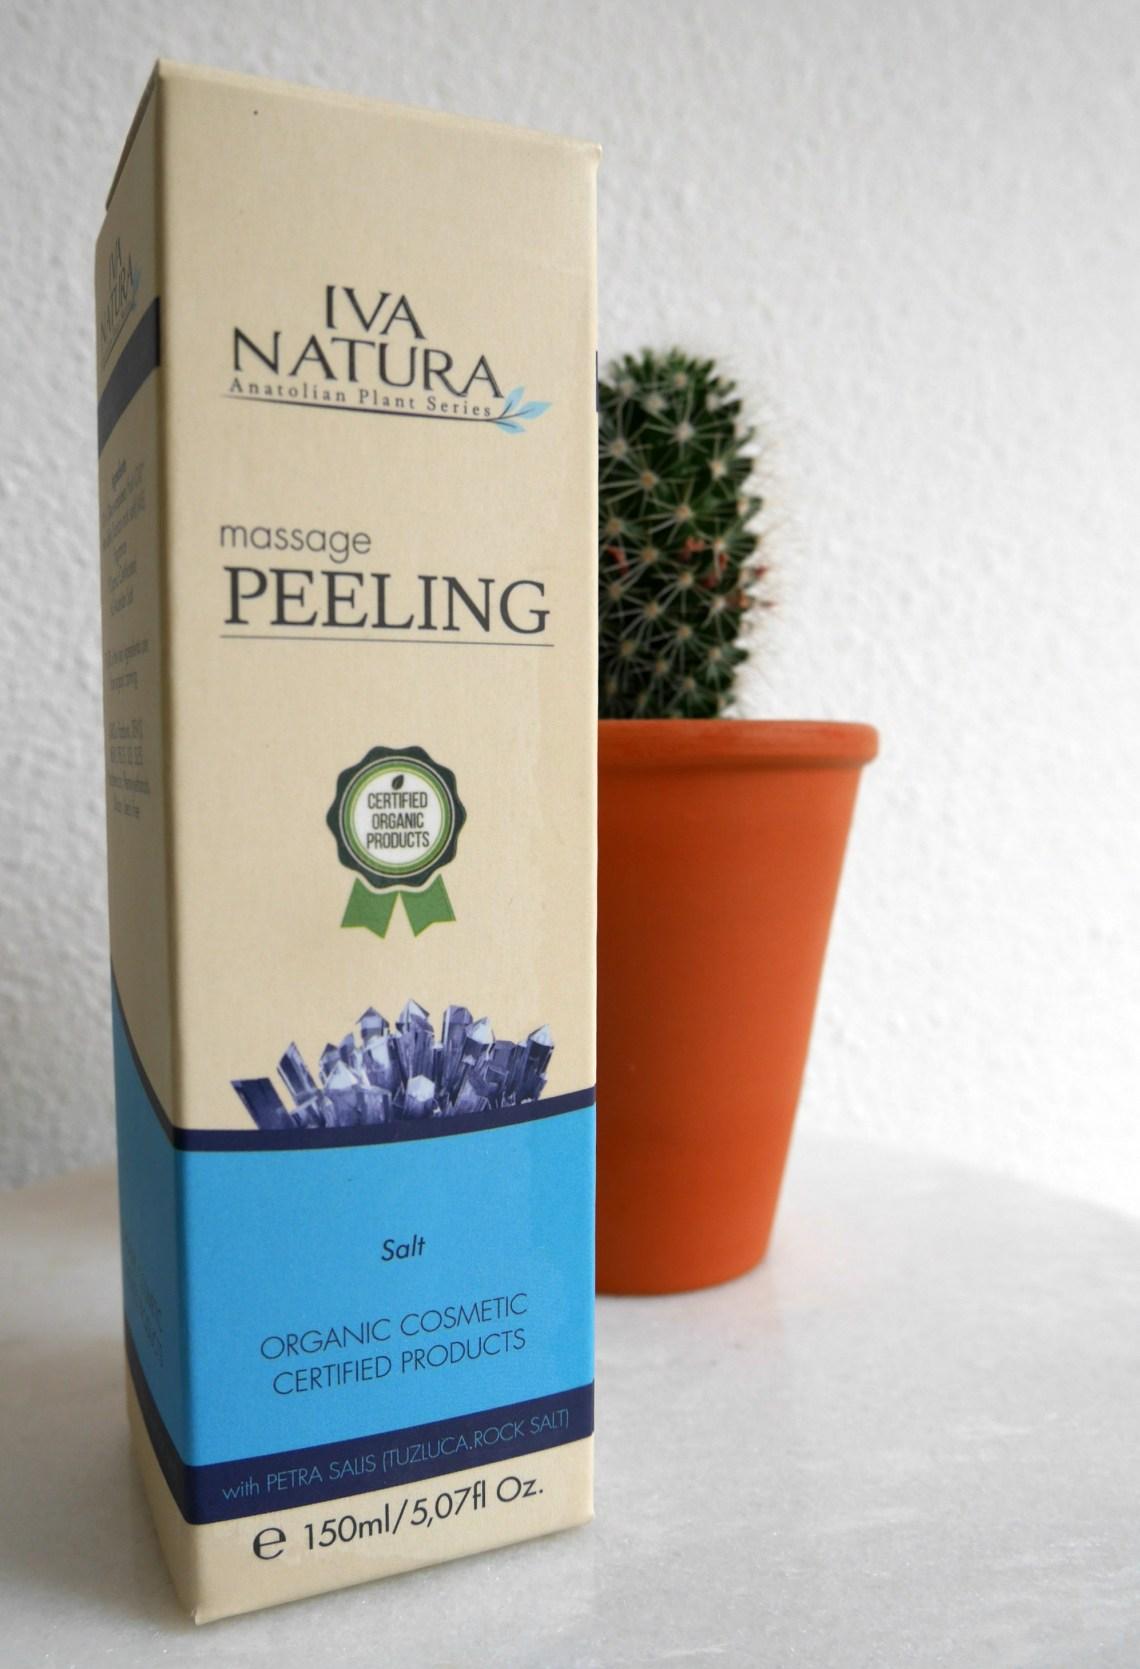 Iva Natura massage peeling